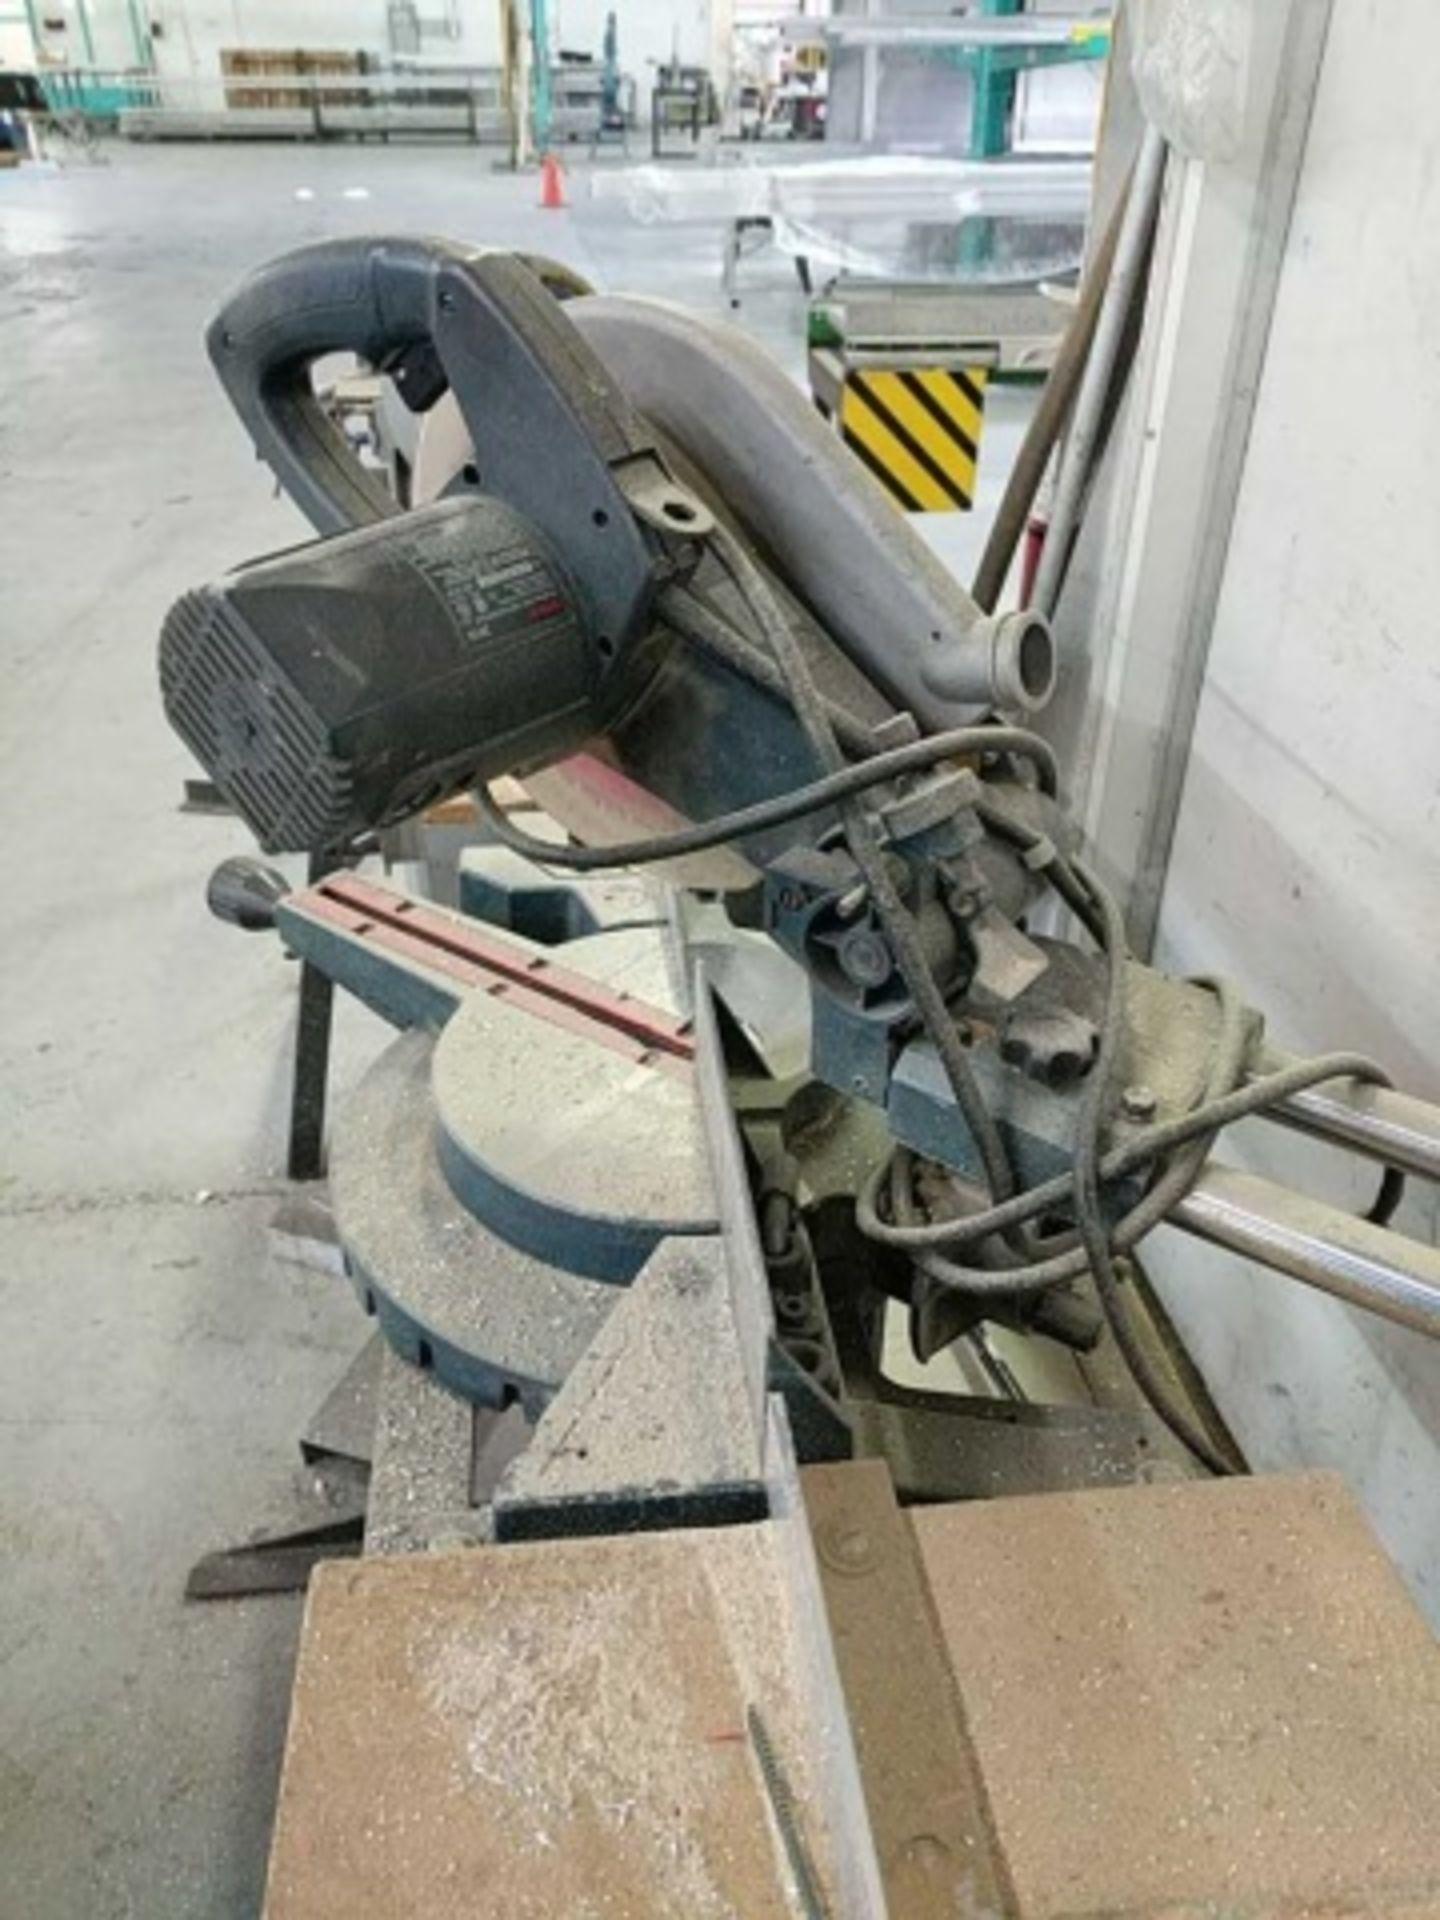 Bosch 3915 Miter Saw - Image 3 of 3